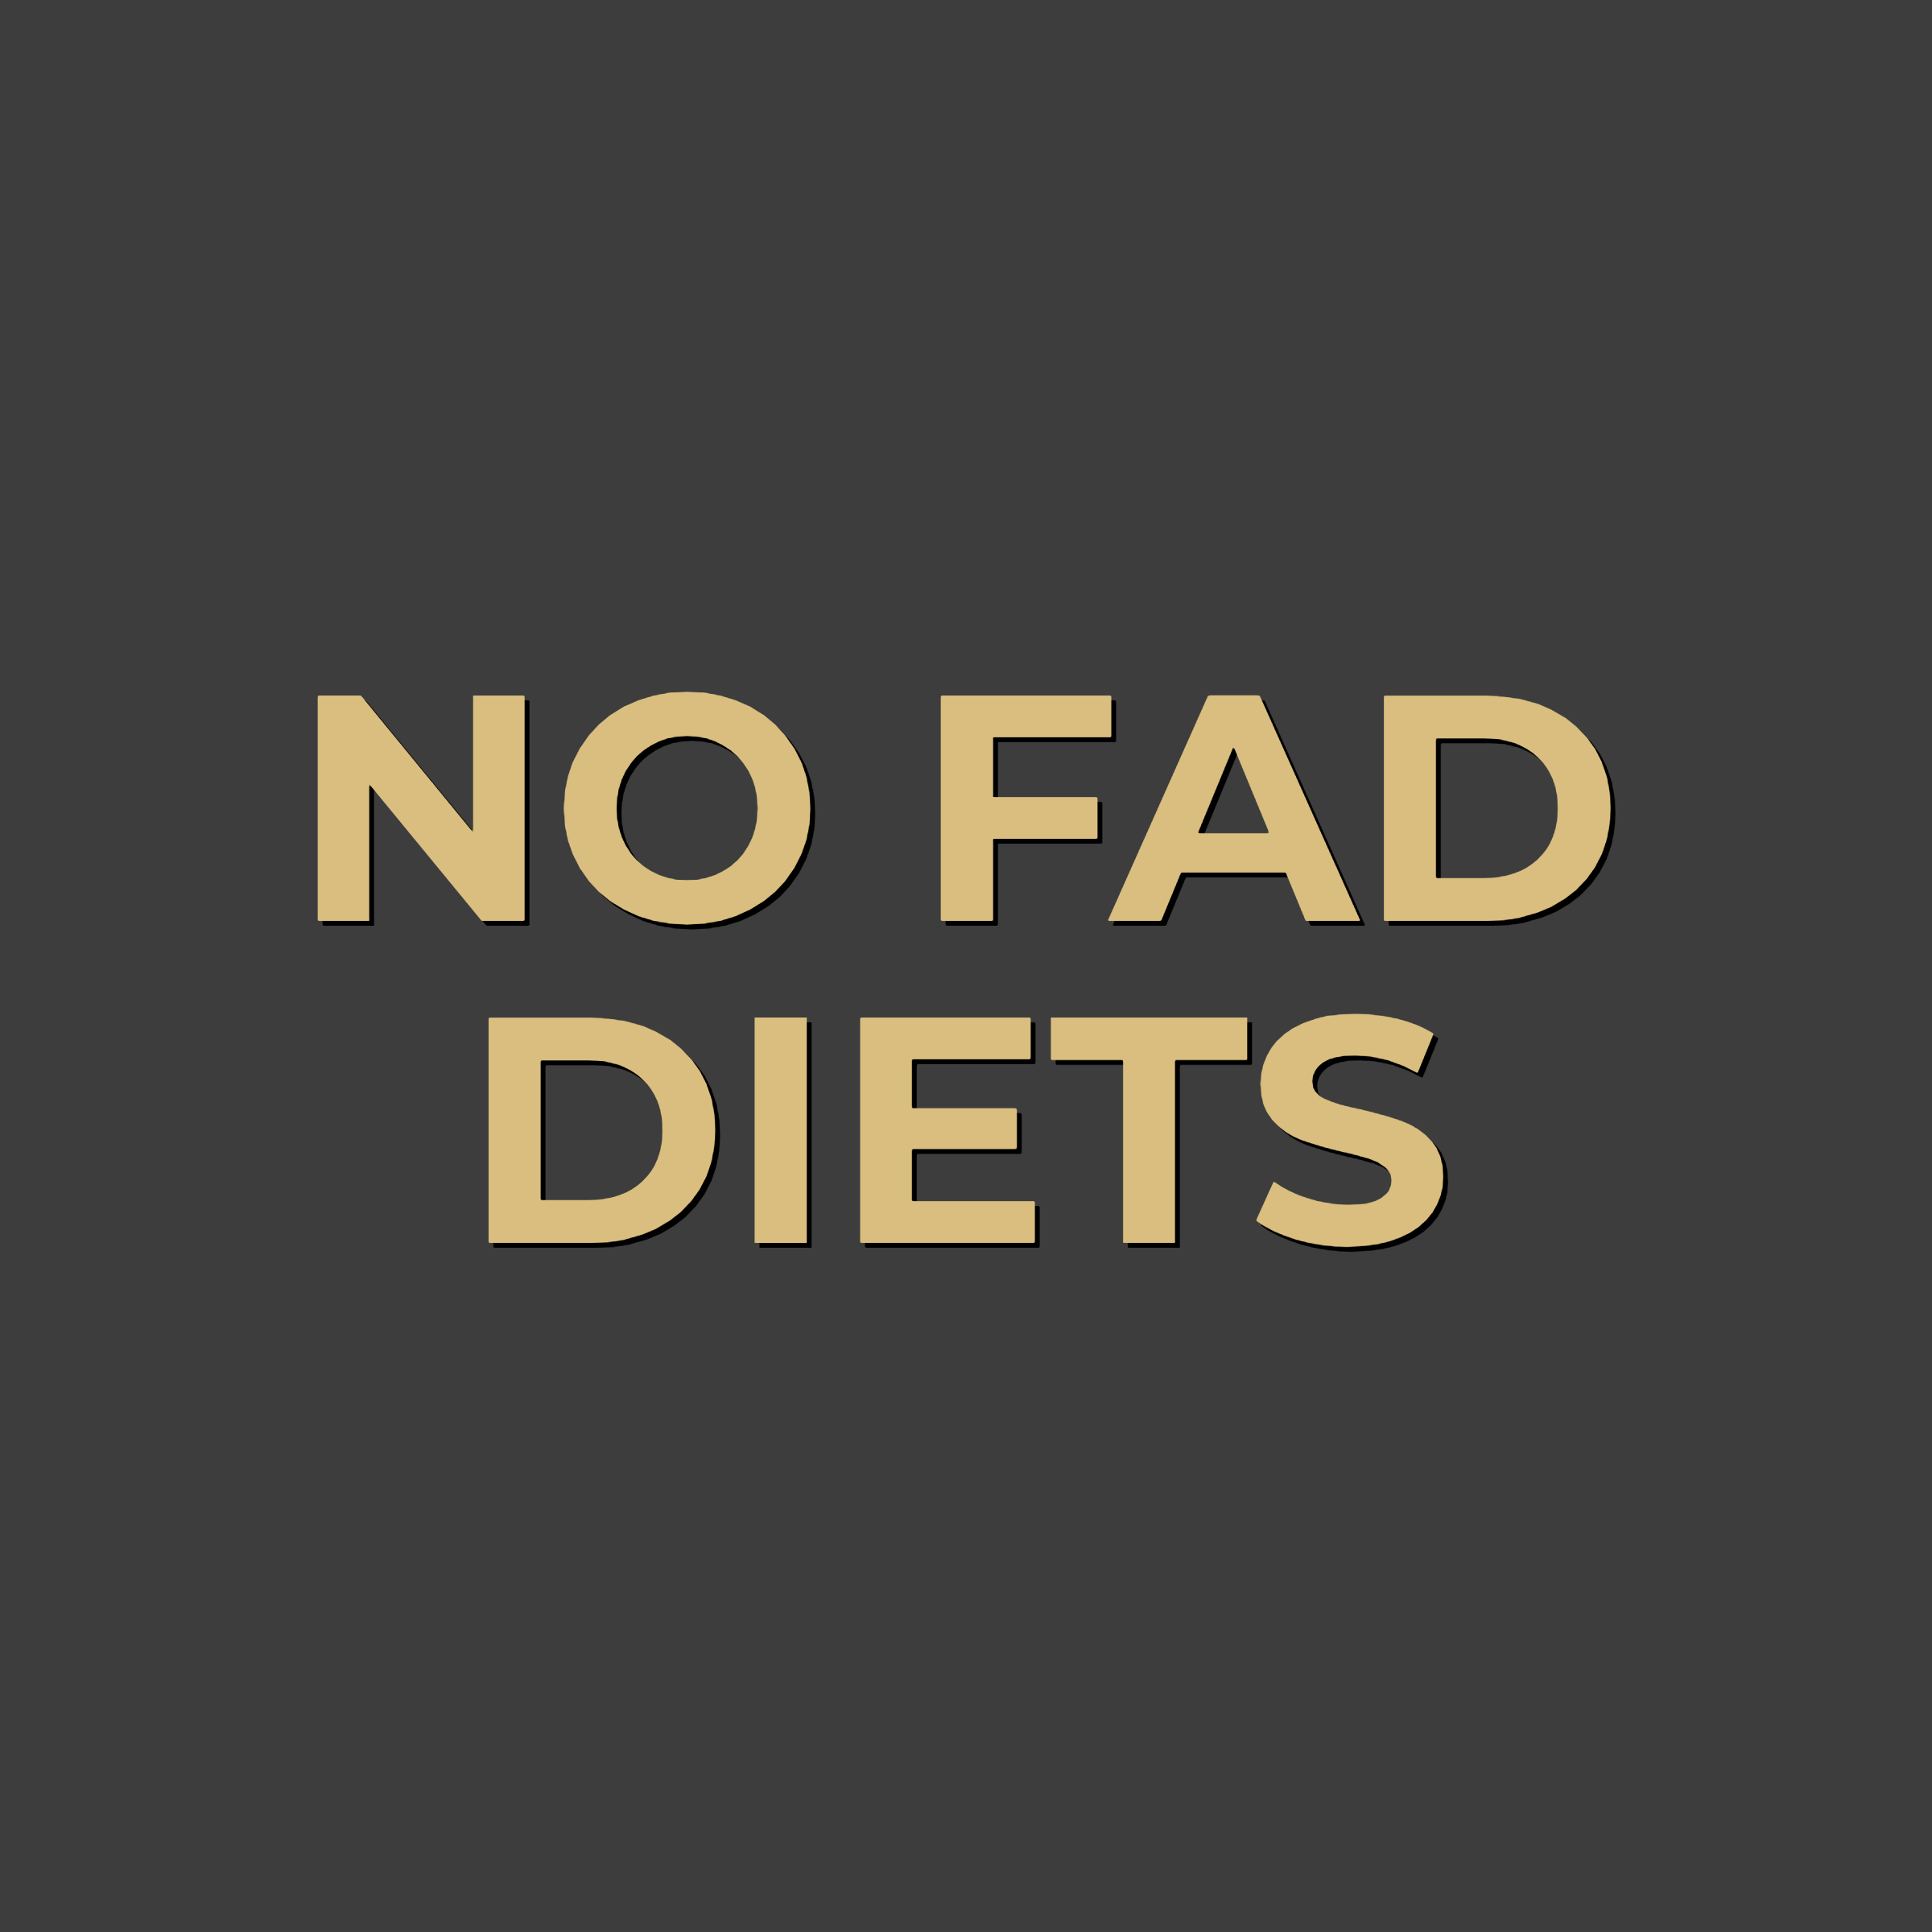 NO FADS.png